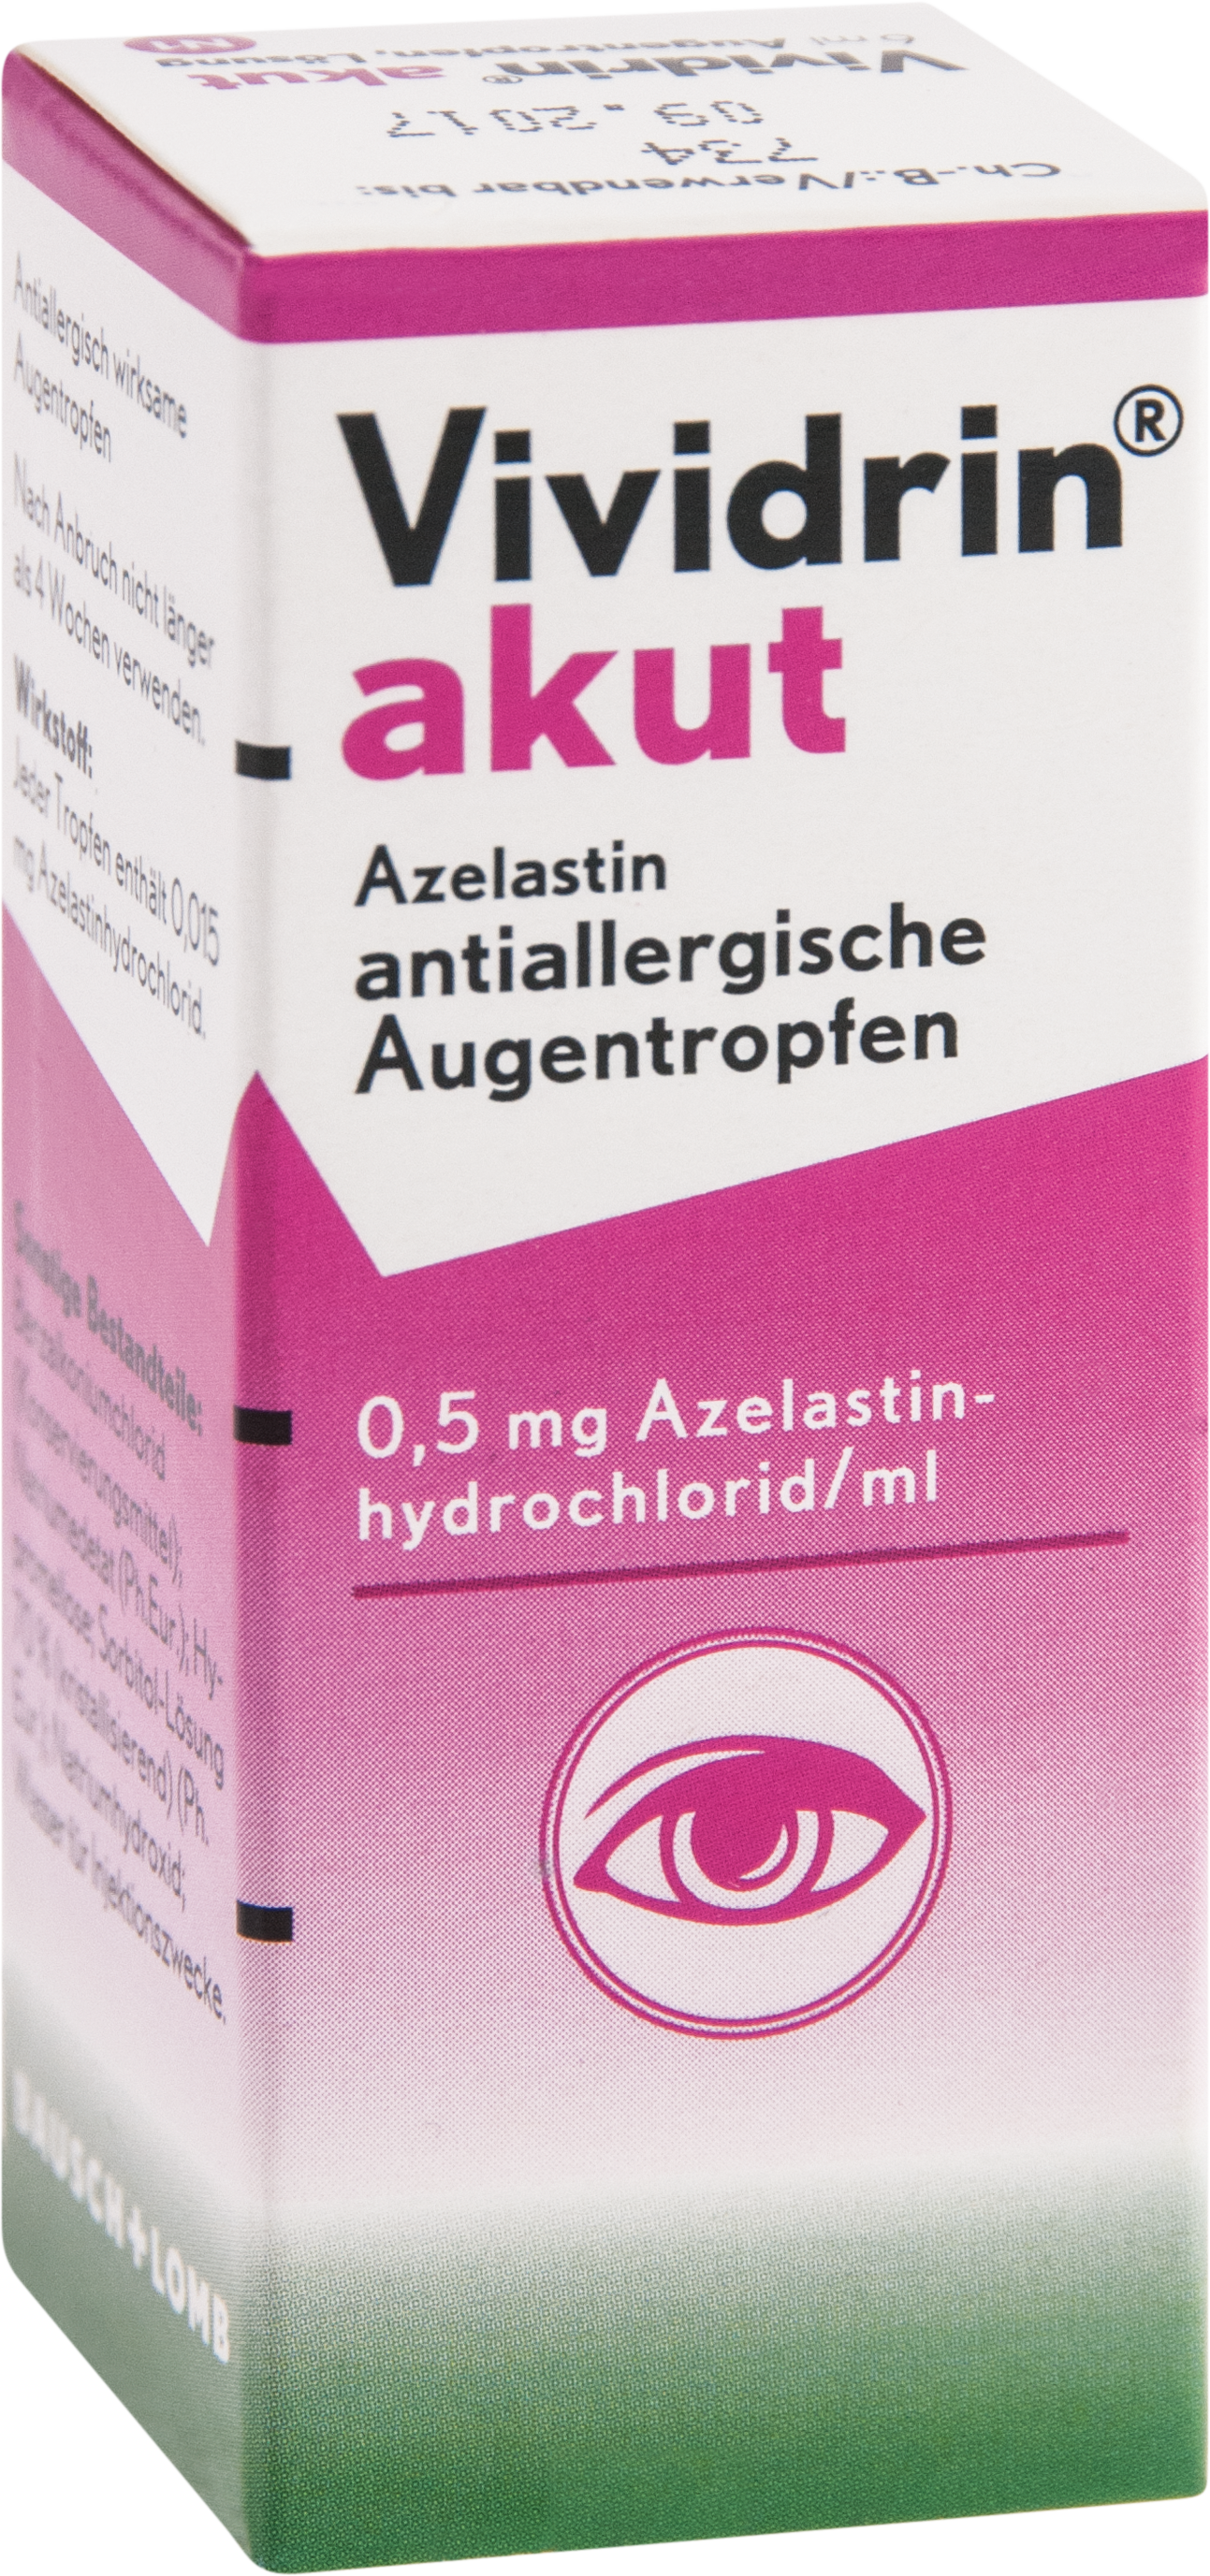 Vividrin akut Azelastin antiallergische Augentropf